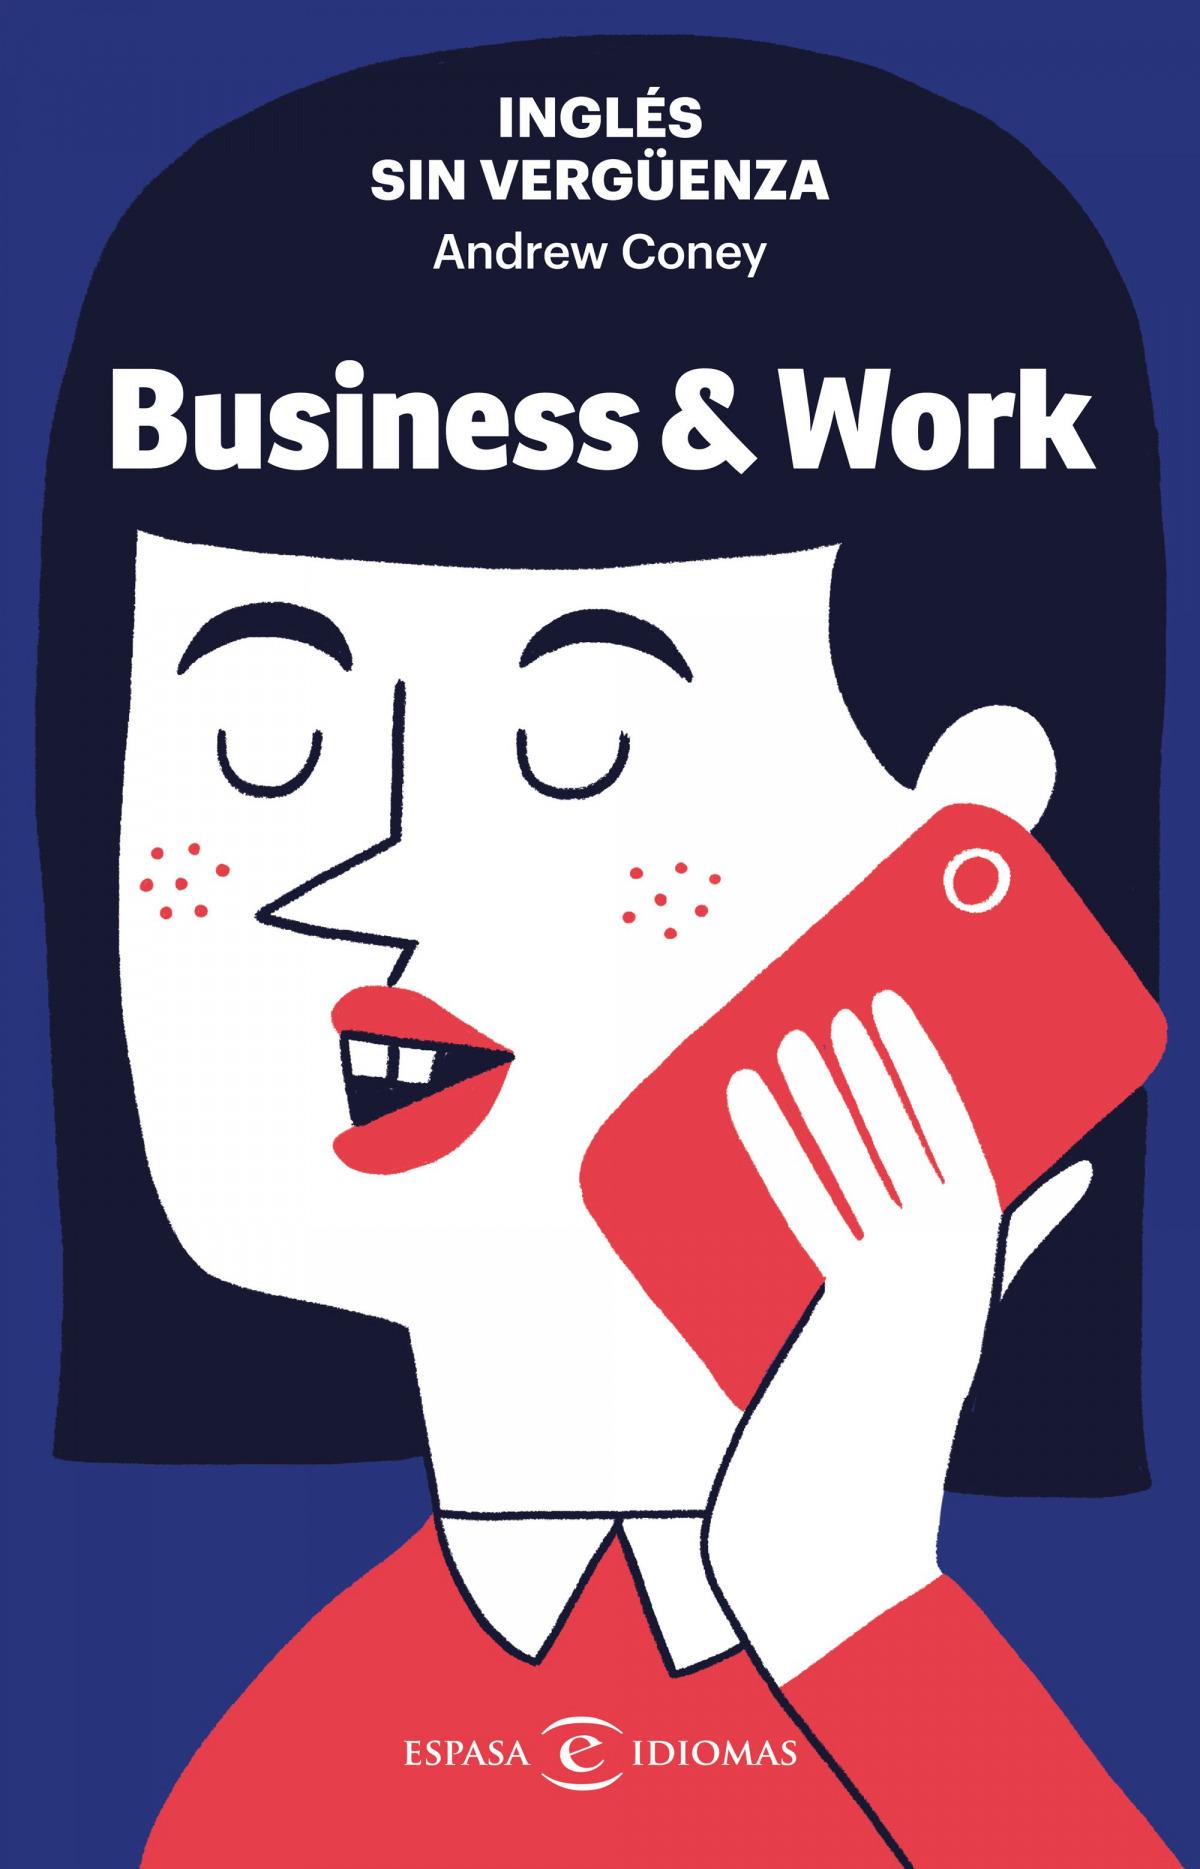 Inglés sin vergüenza: Business